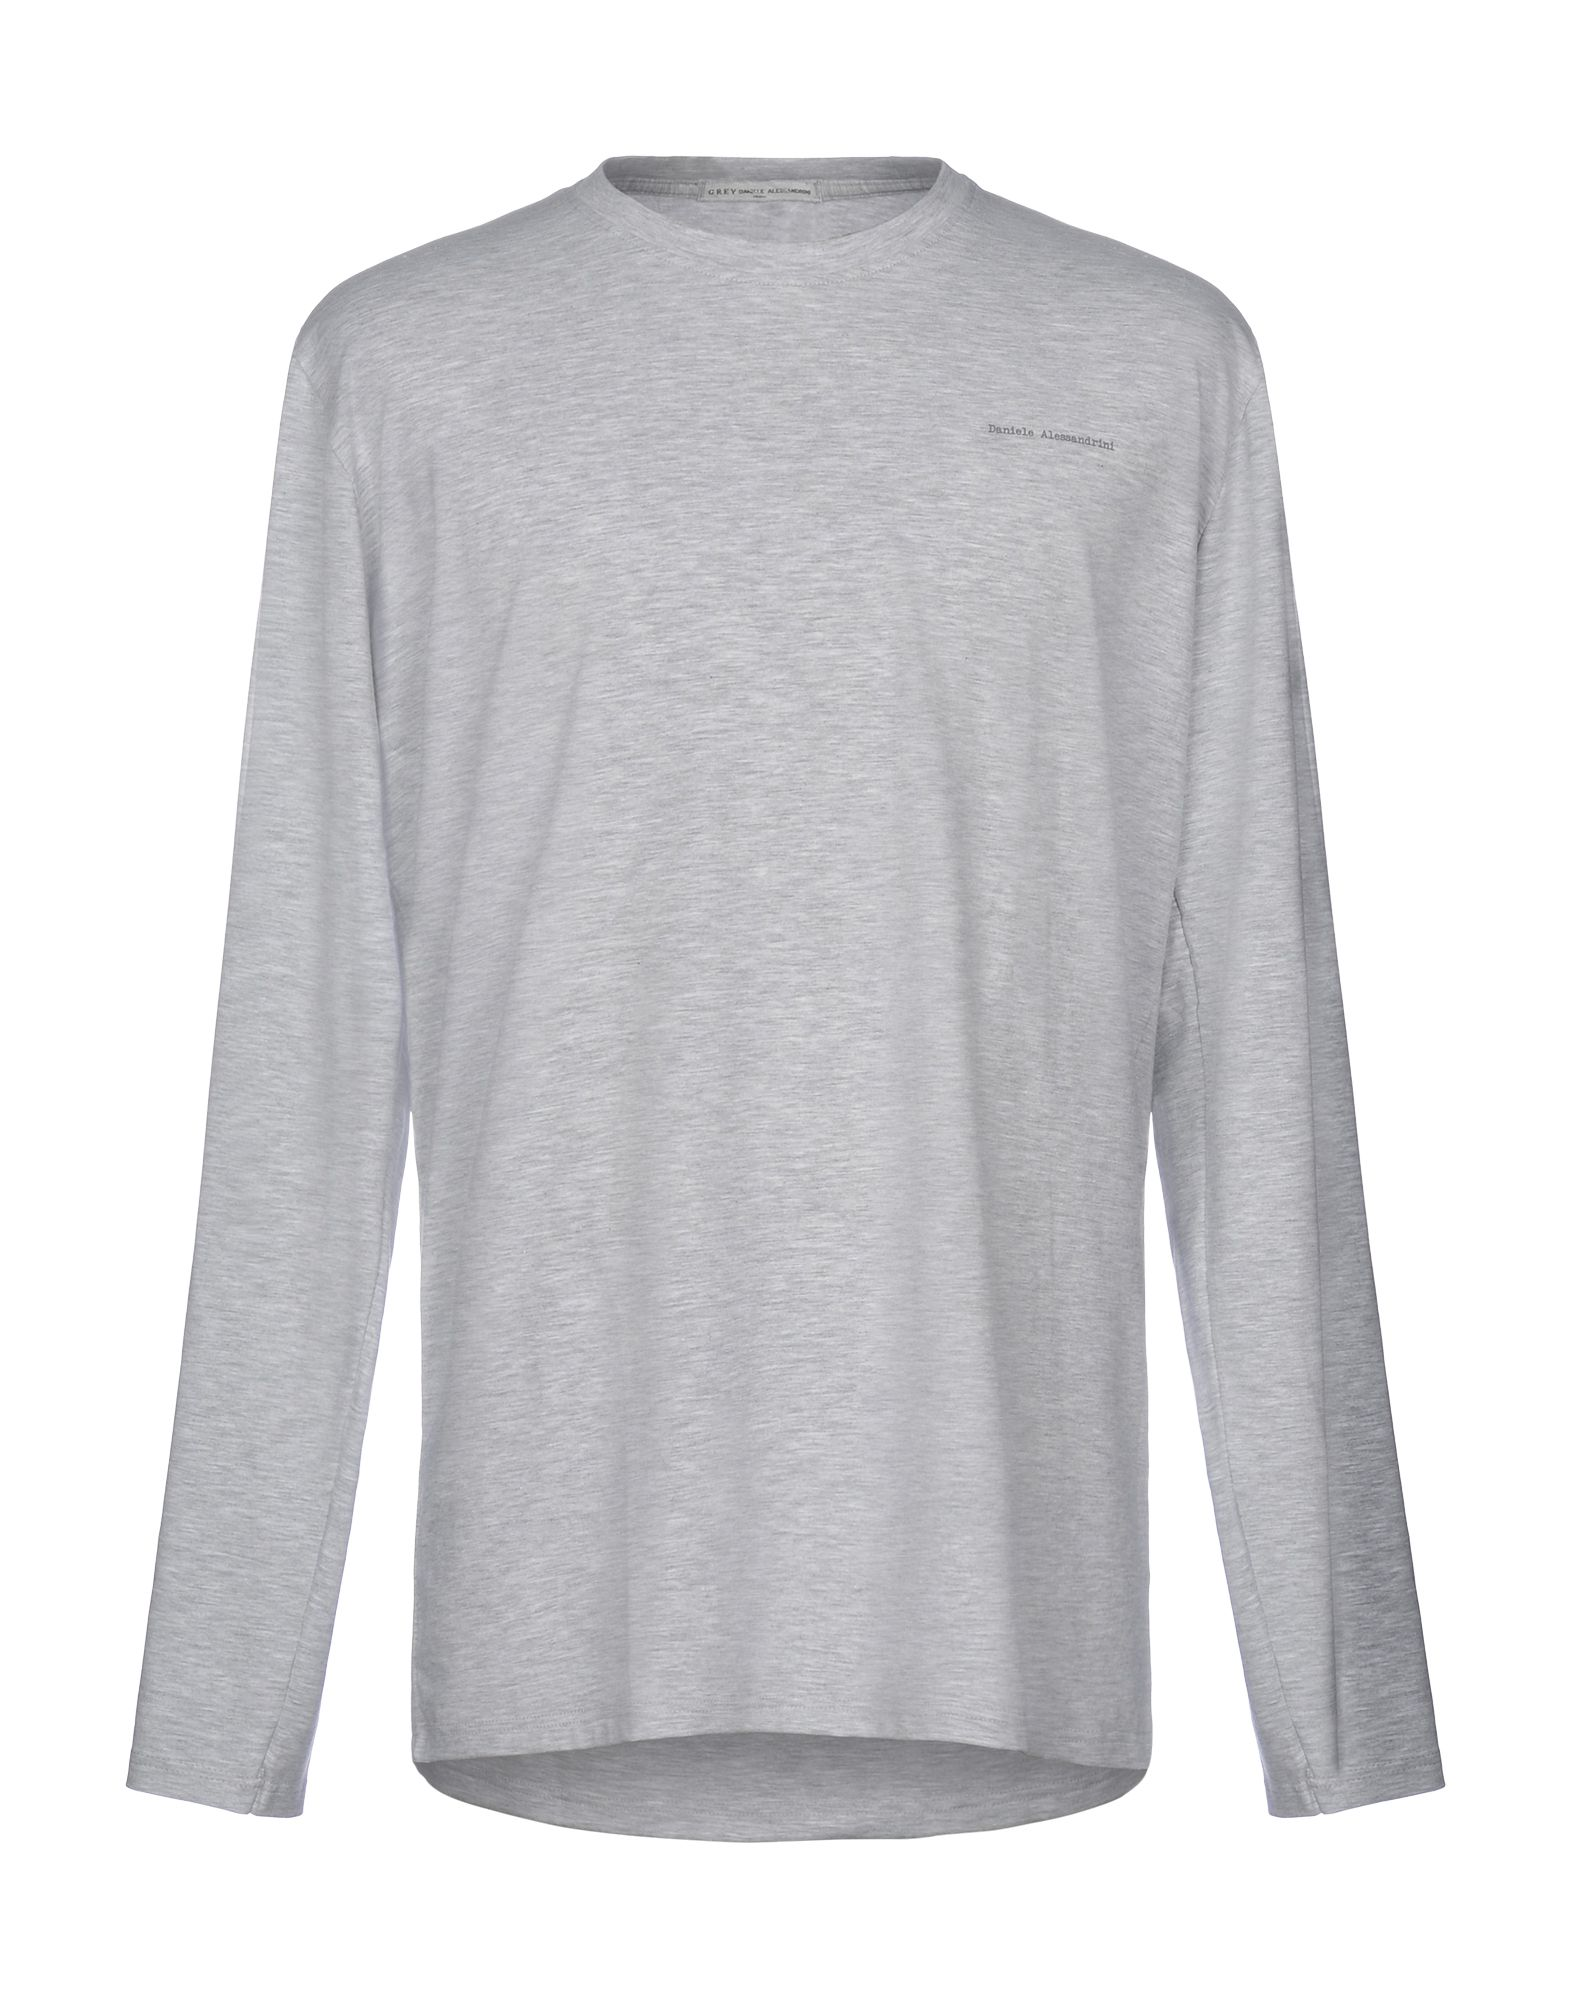 T-Shirt Daniele Alessandrini 12205191JG Uomo - 12205191JG Alessandrini b7e357